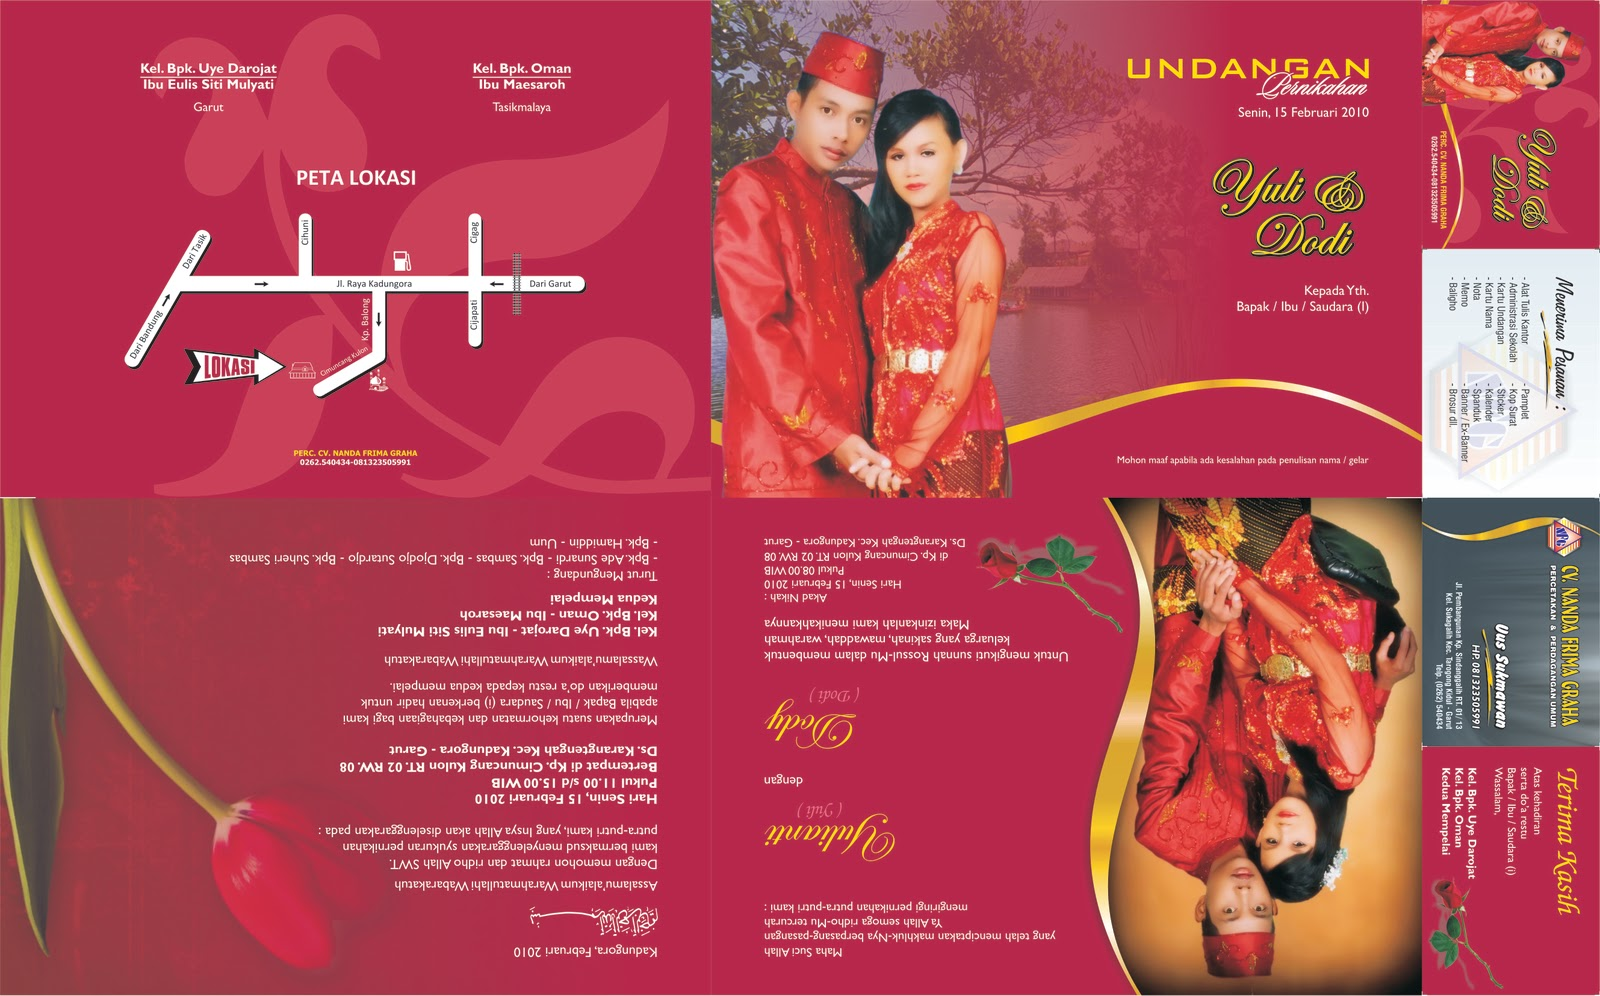 undangan pernikahan floral undangan pernikahan bunga